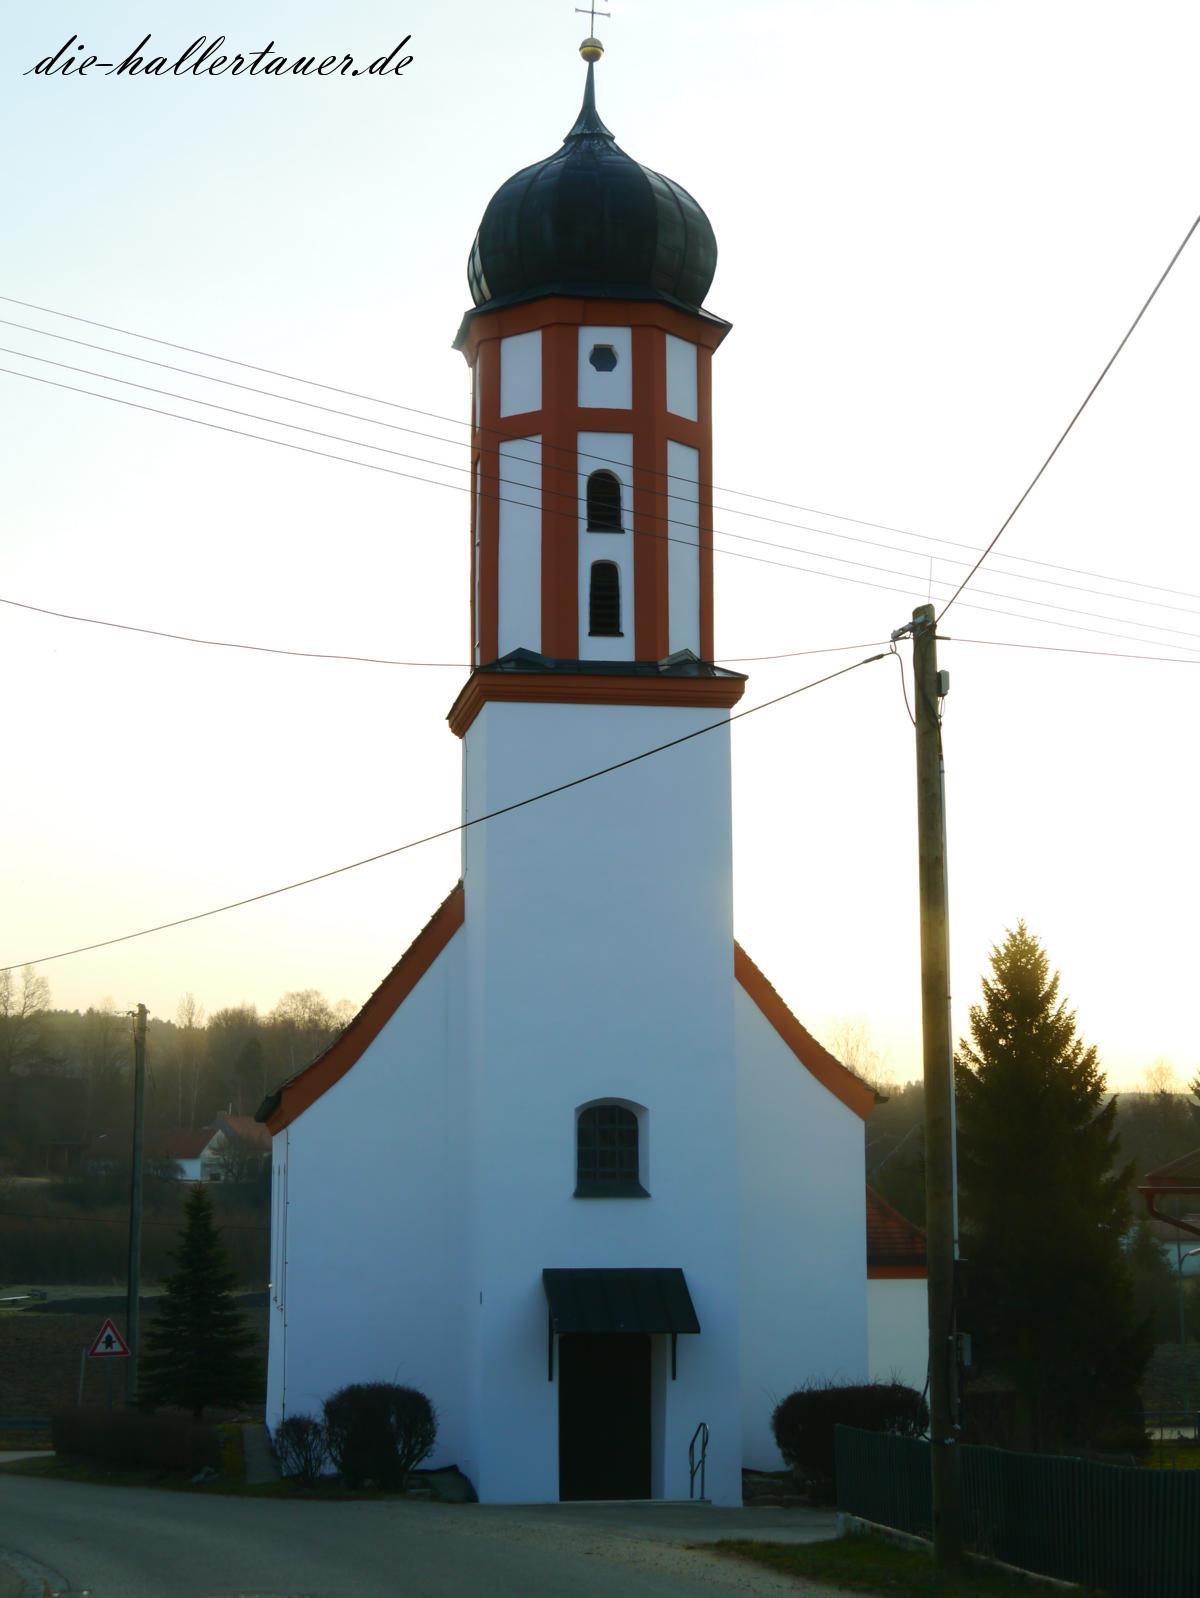 Larsbach